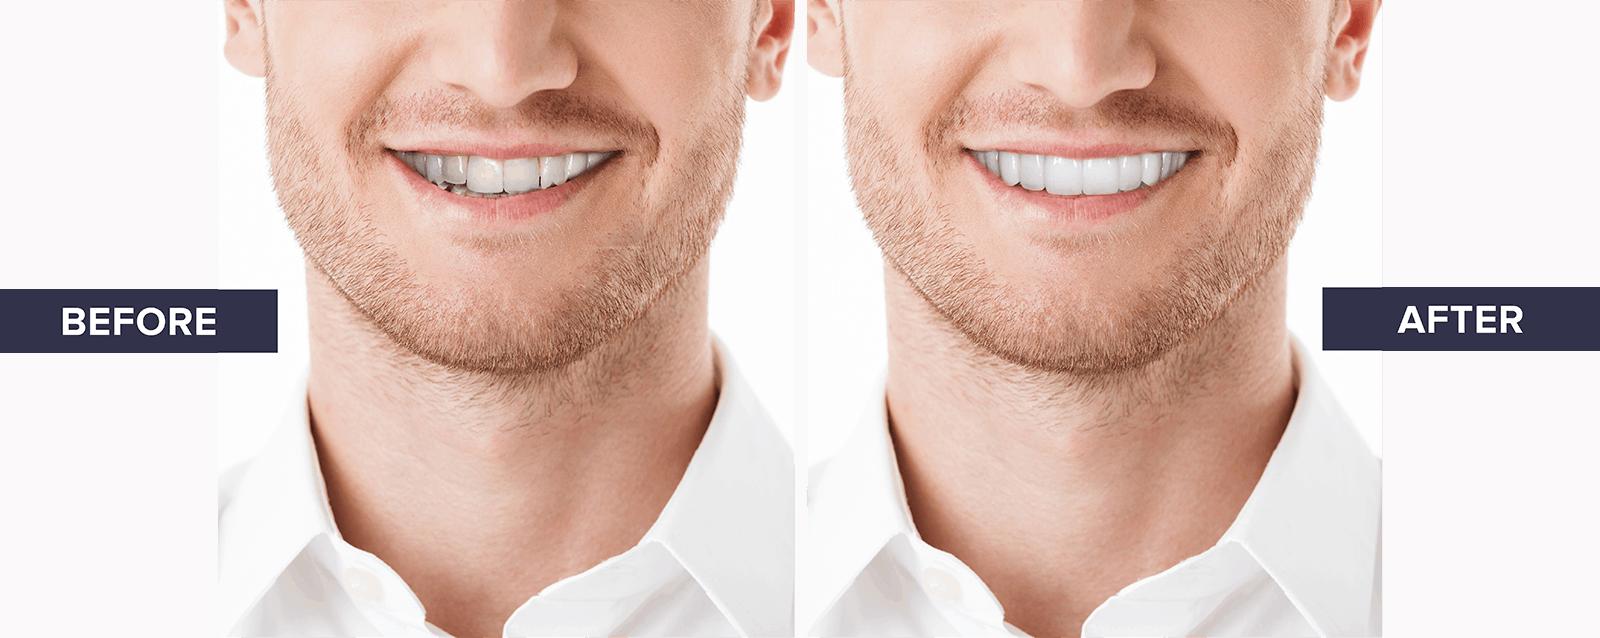 Veneers comparison after treatment